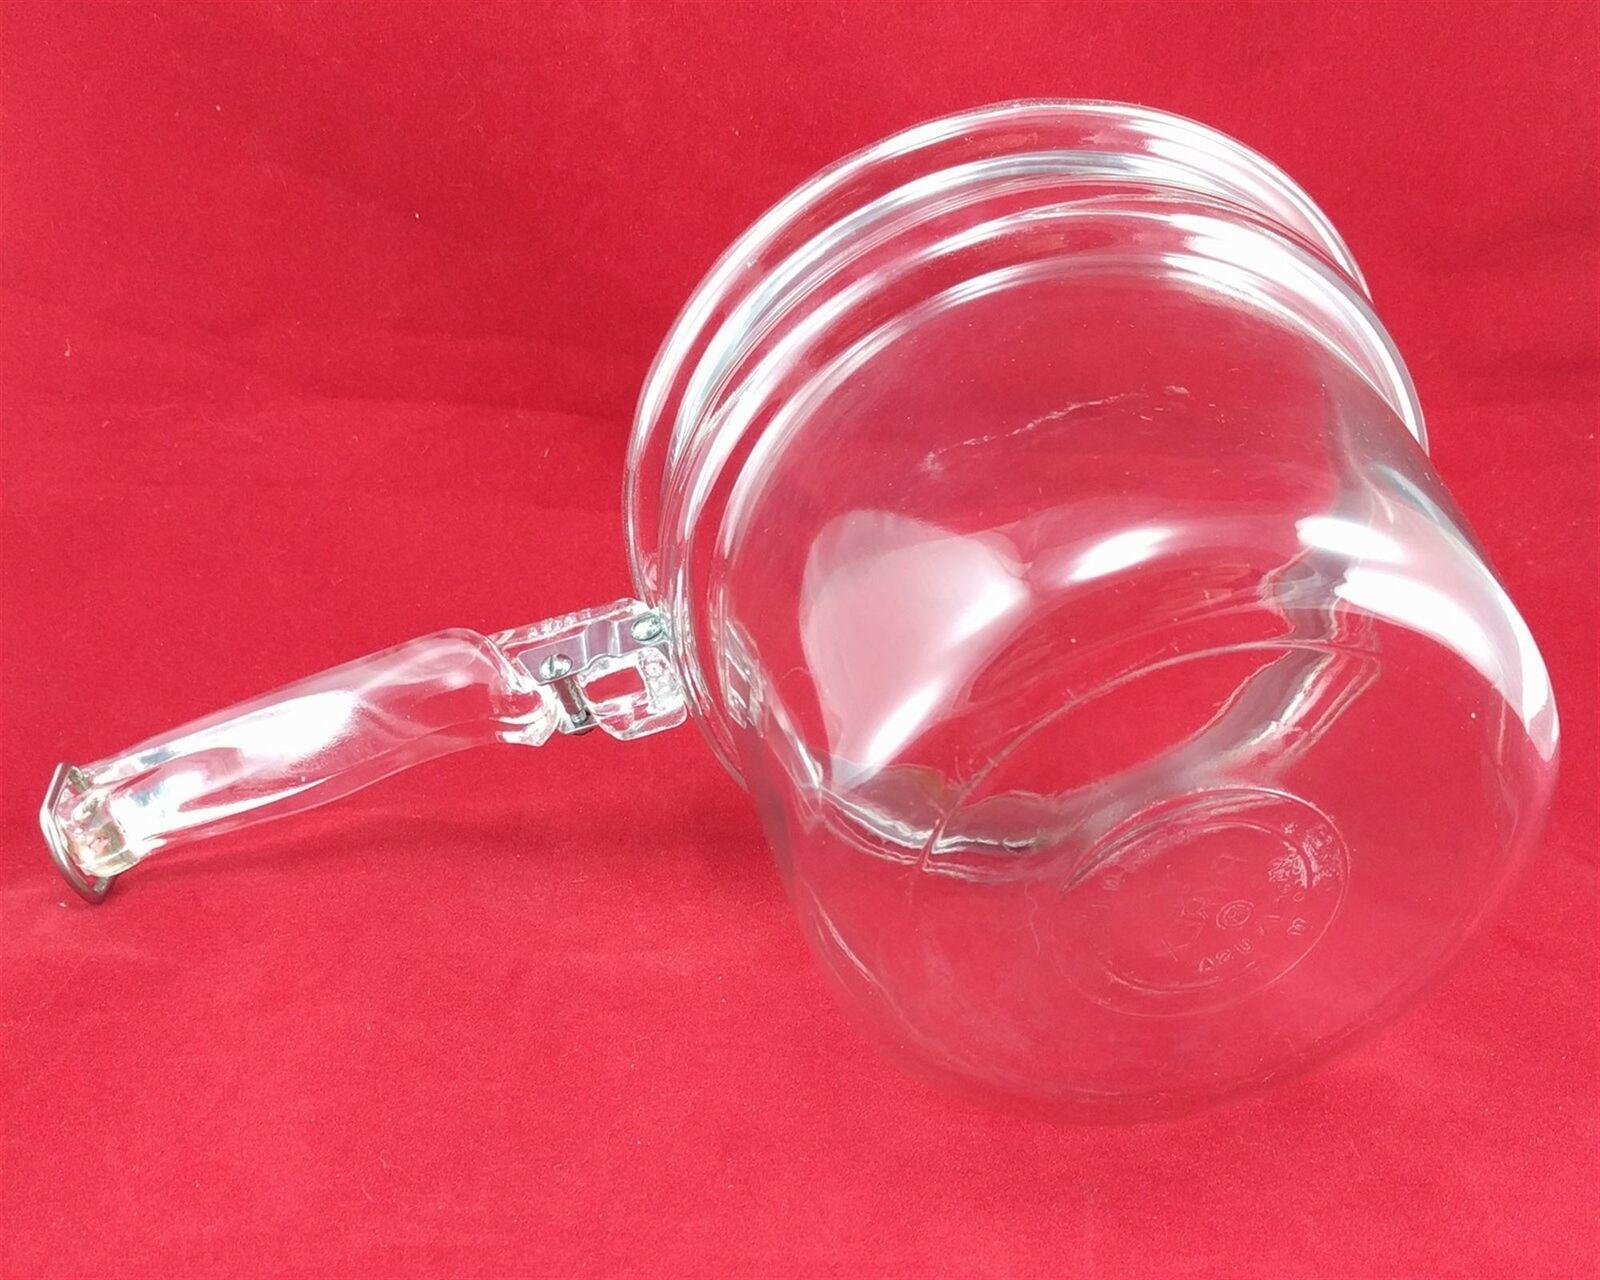 Pyrex Flameware 6283U 1½ qt Vintage Glass Saucepan w/ Stainless Steel Band image 6